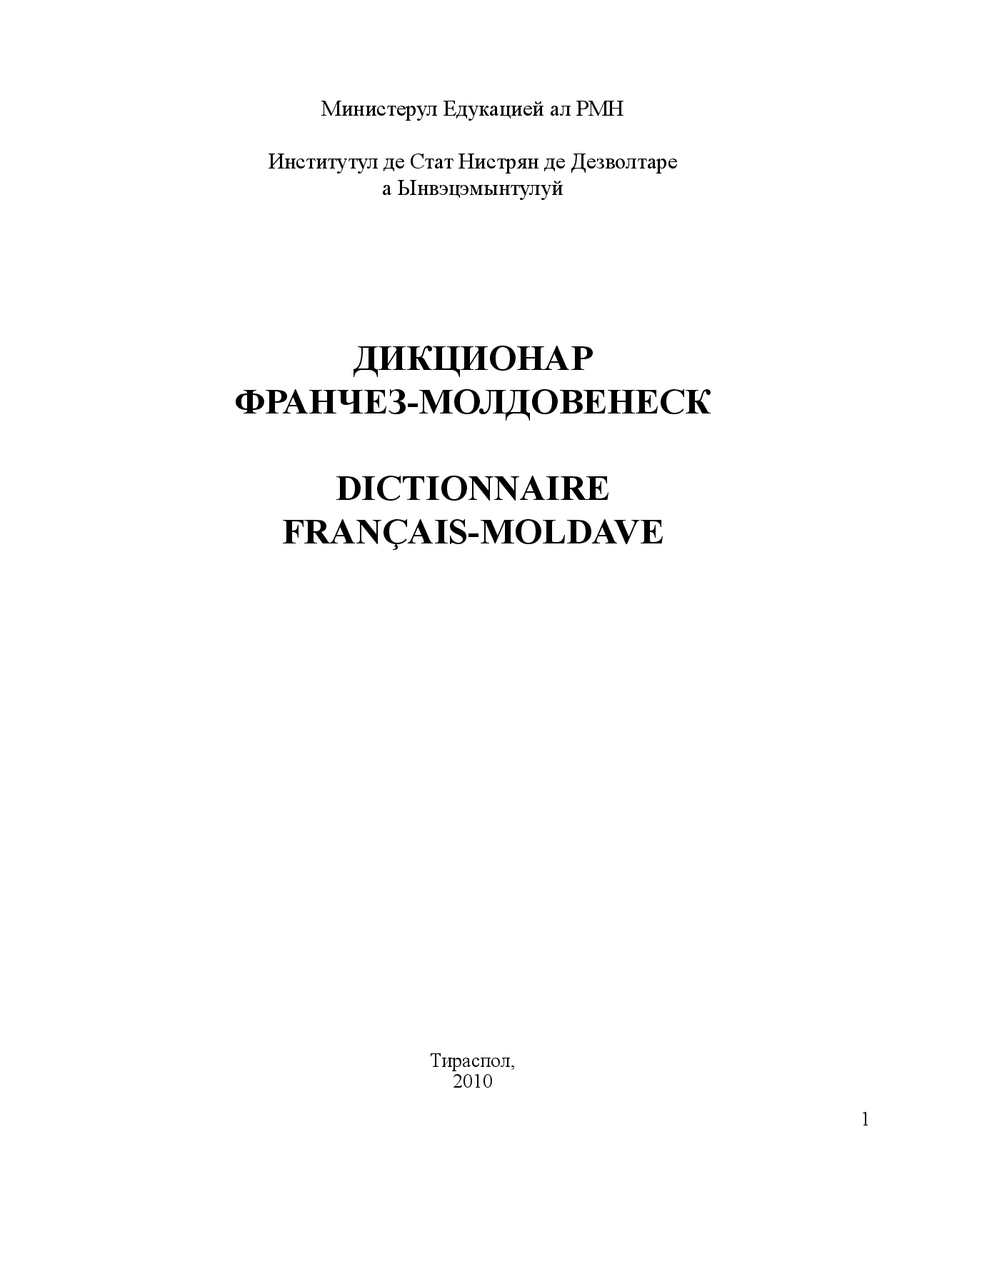 Calaméo дикционар франчез молдовенеск